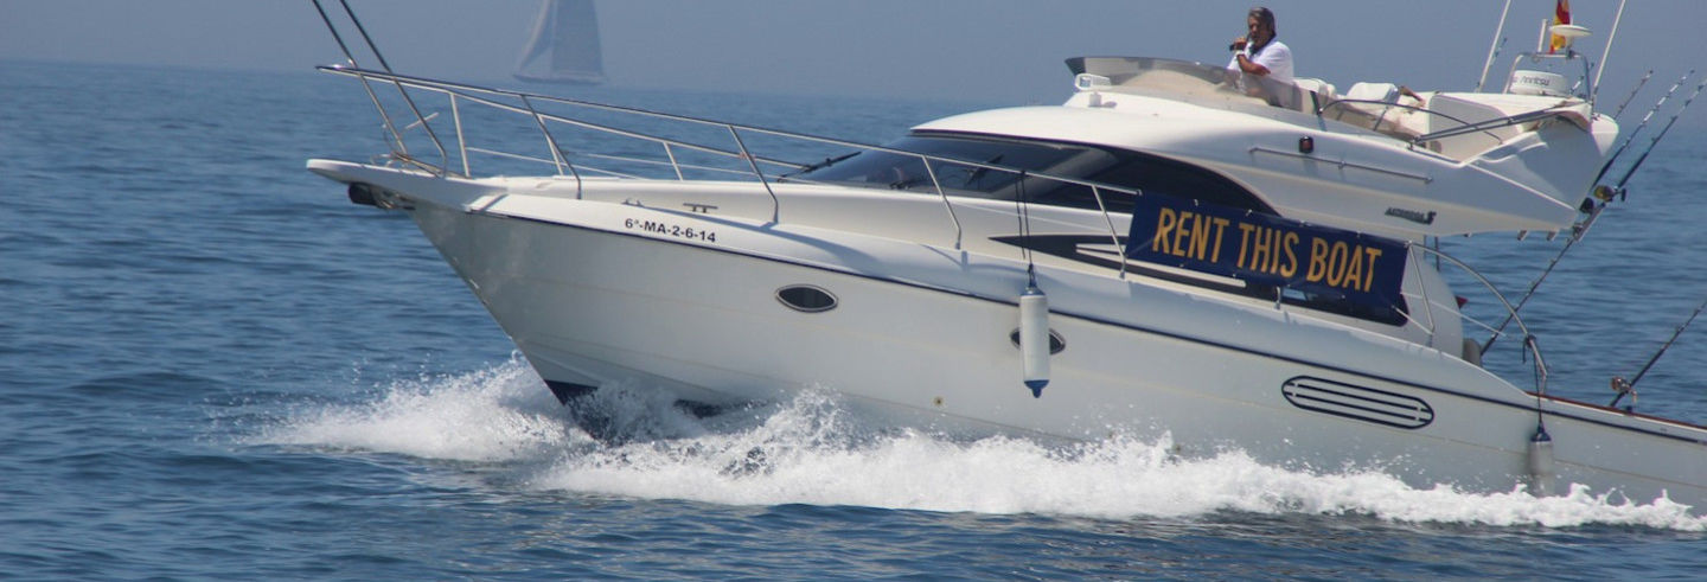 Paseo en barco privado por Puerto Banús